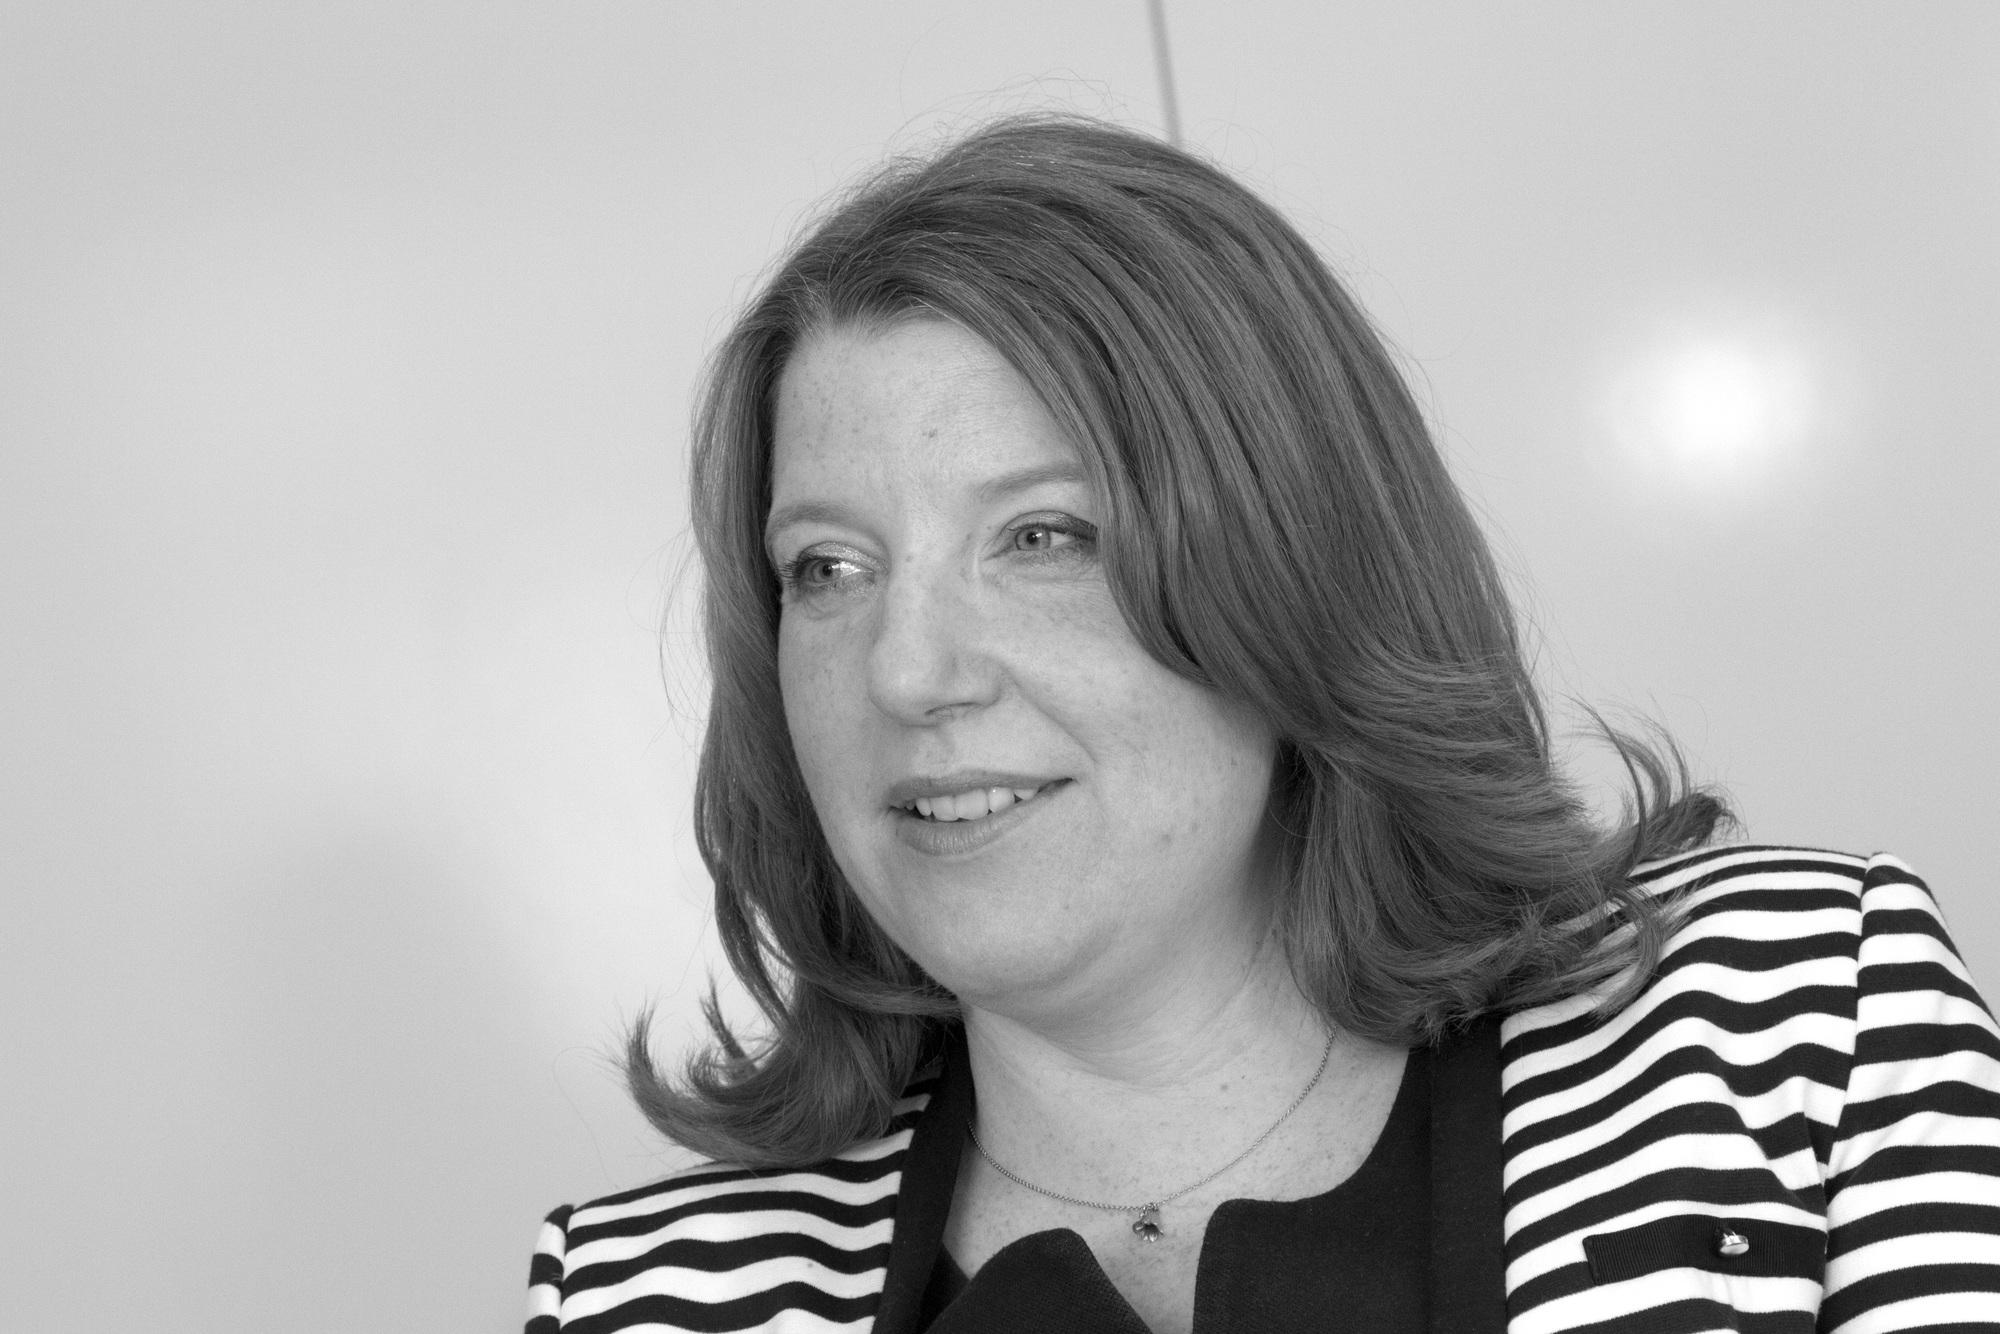 Angela Jewell